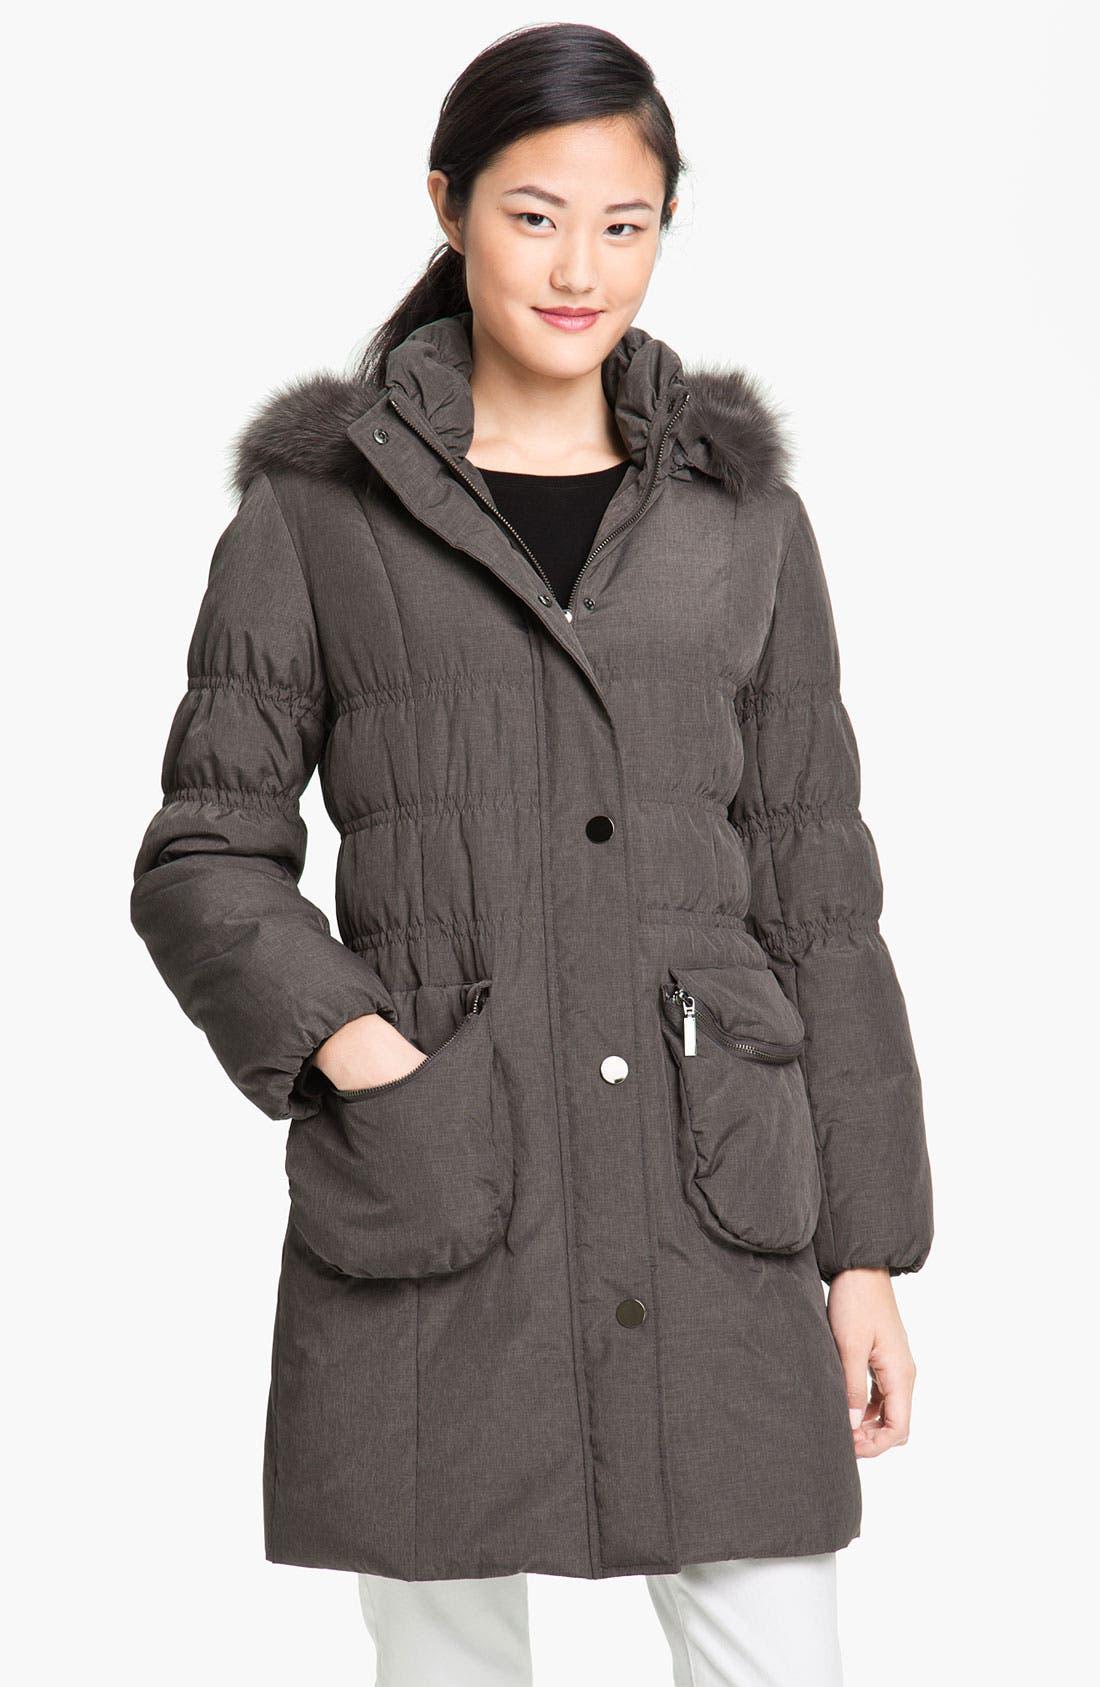 Alternate Image 1 Selected - Jessica Wilde Down Coat with Genuine Fox Fur